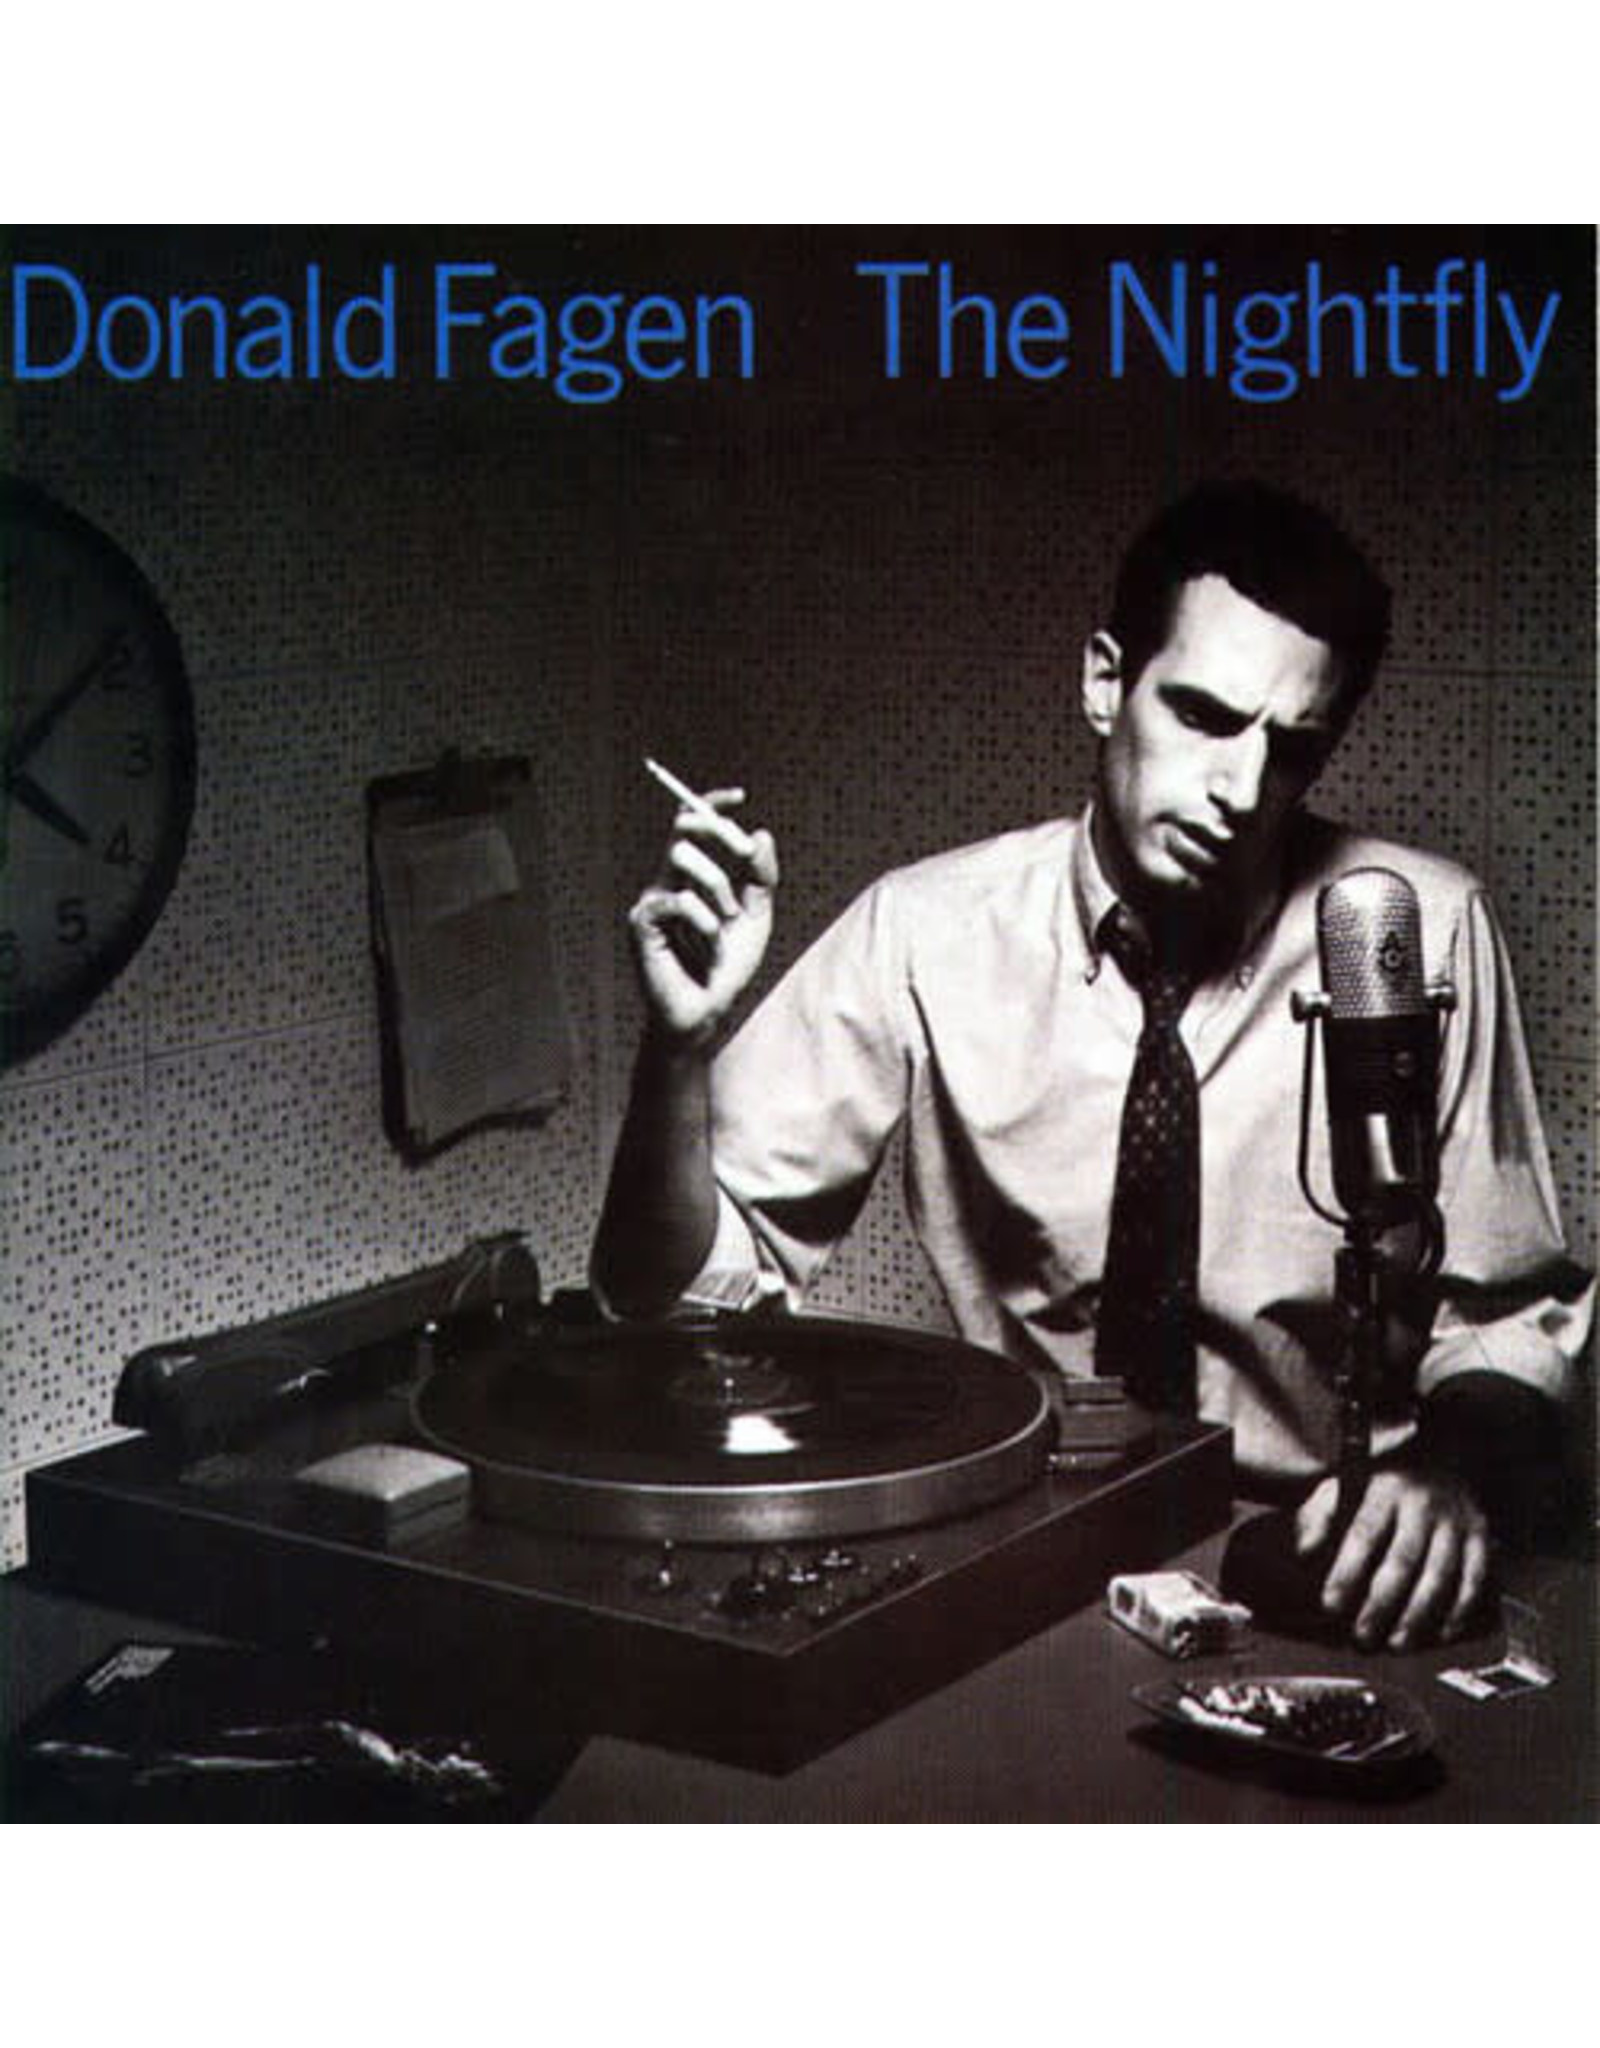 New Vinyl Donald Fagen - The Nightfly LP